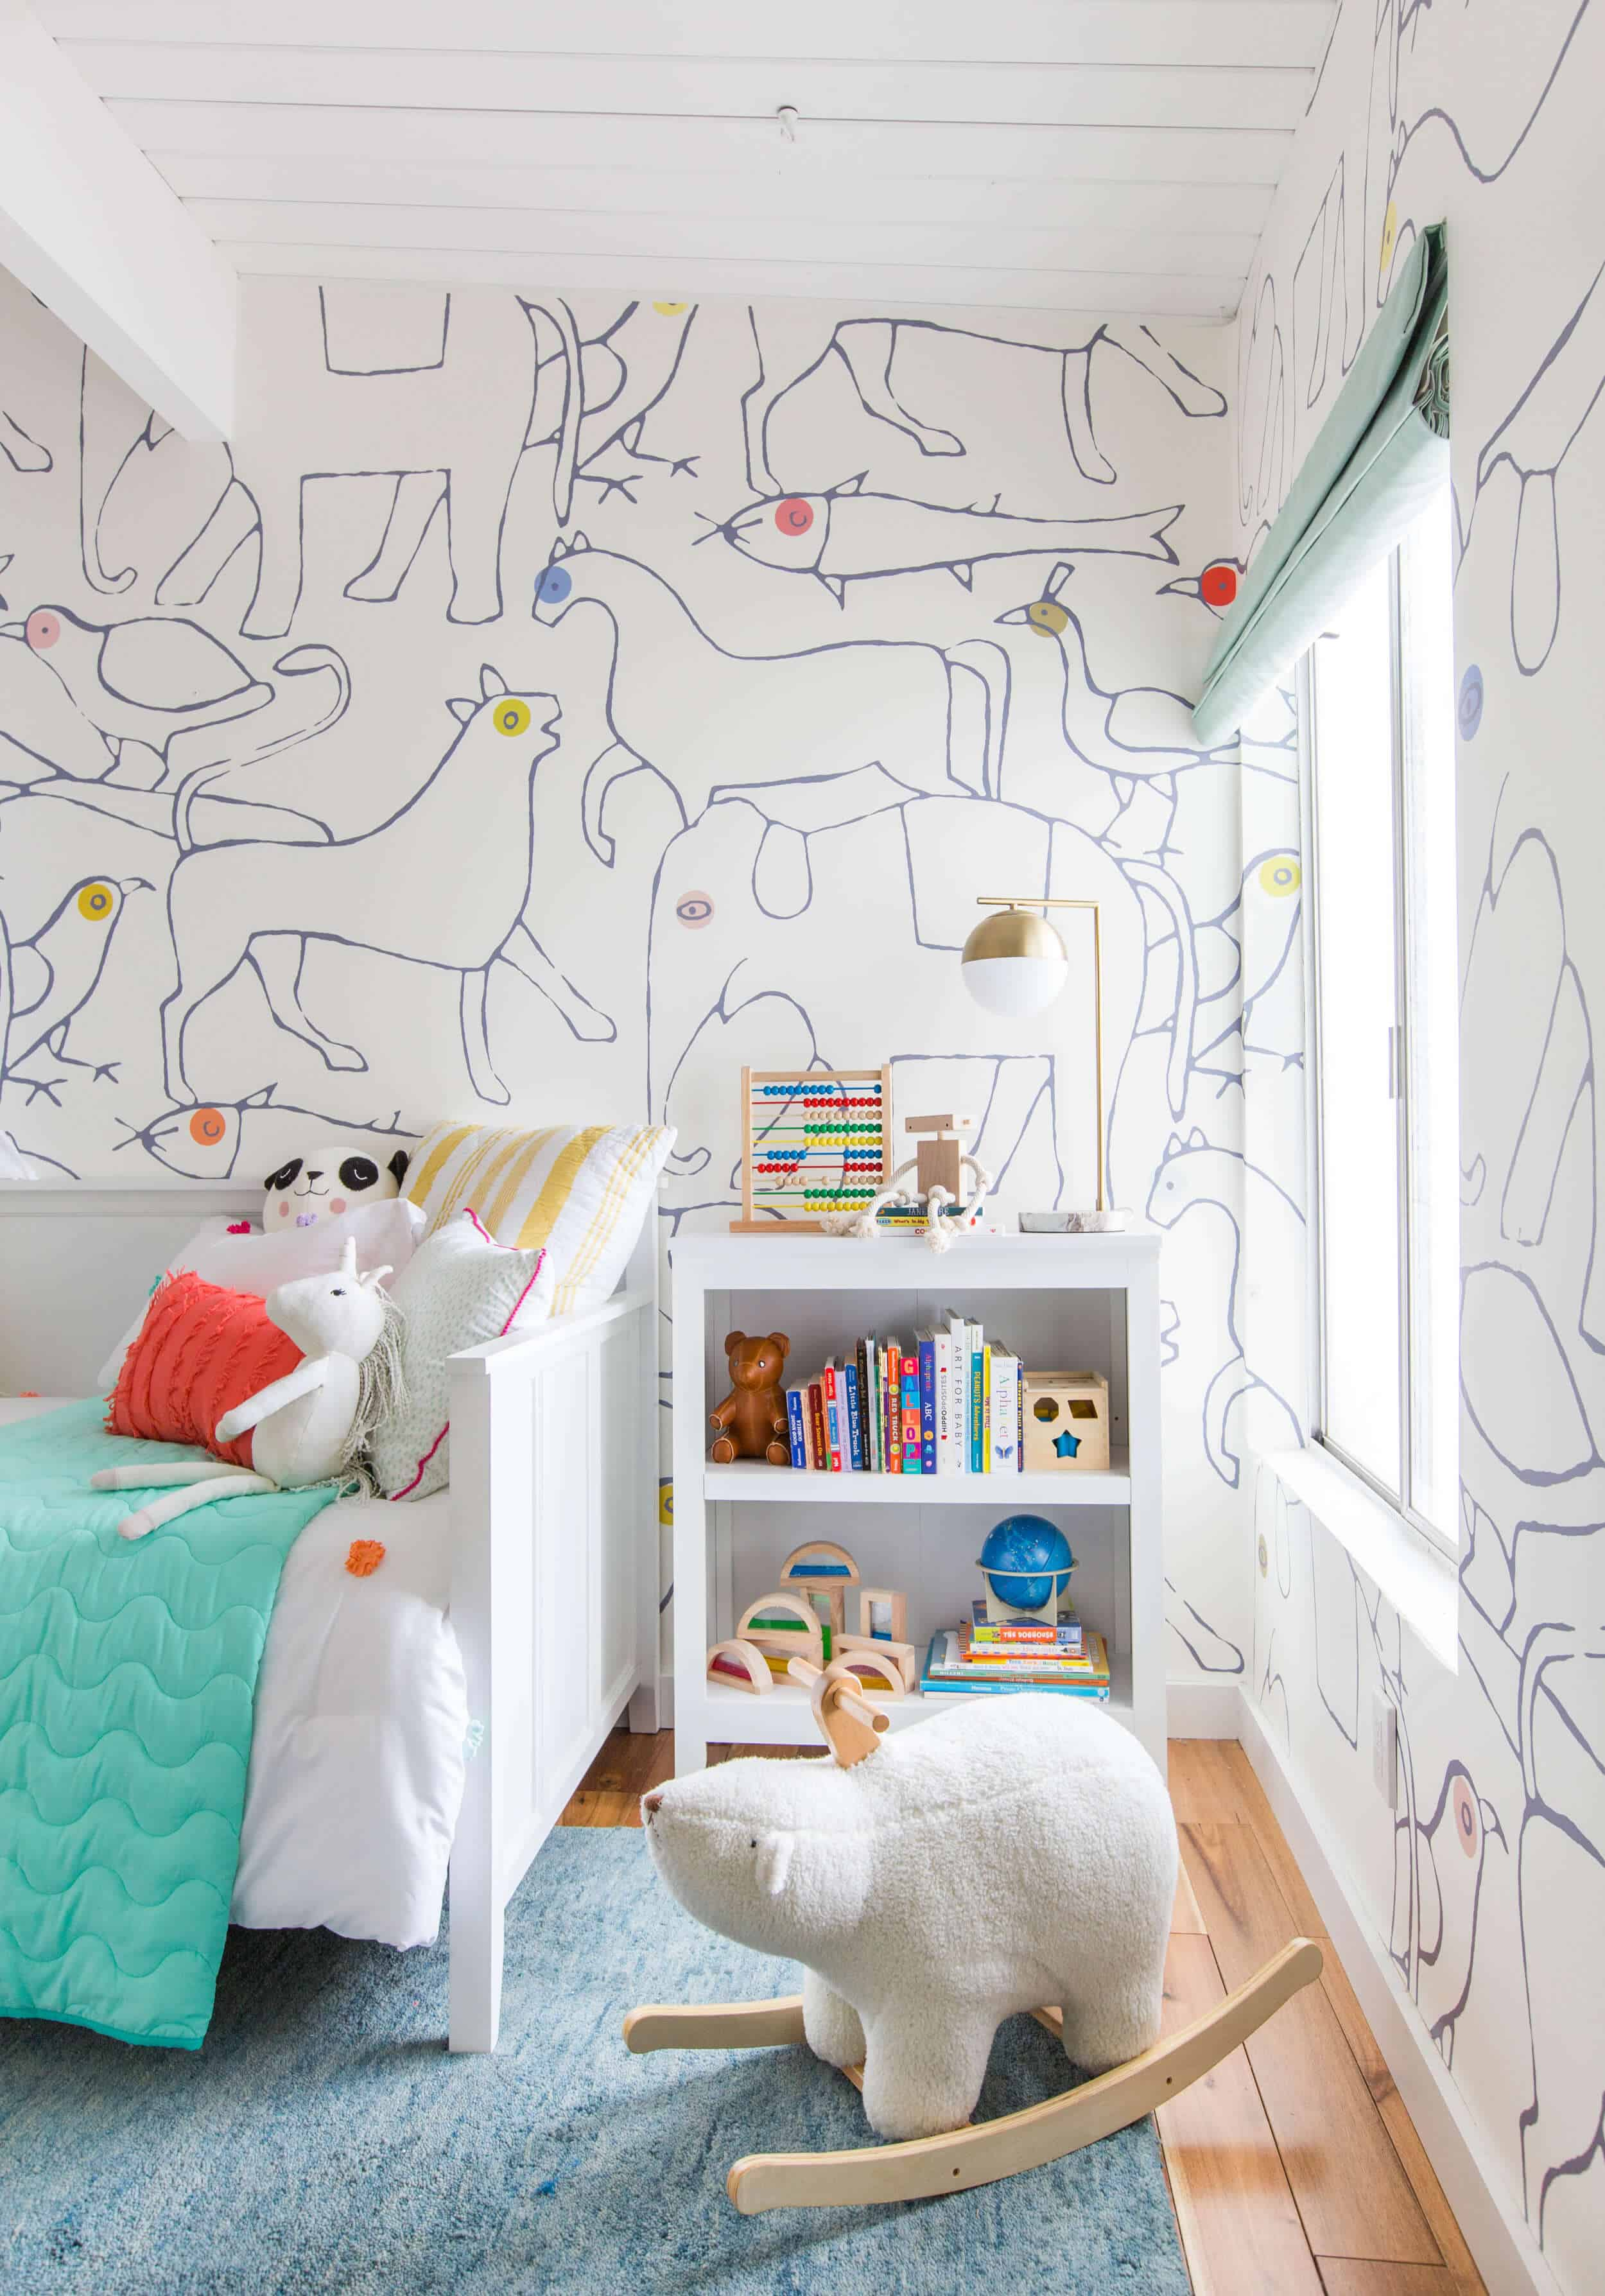 emily-henderson_kids-room_target_bedding_layered_light_texture_blue_white_brass_nursery_girls-room_bright_11